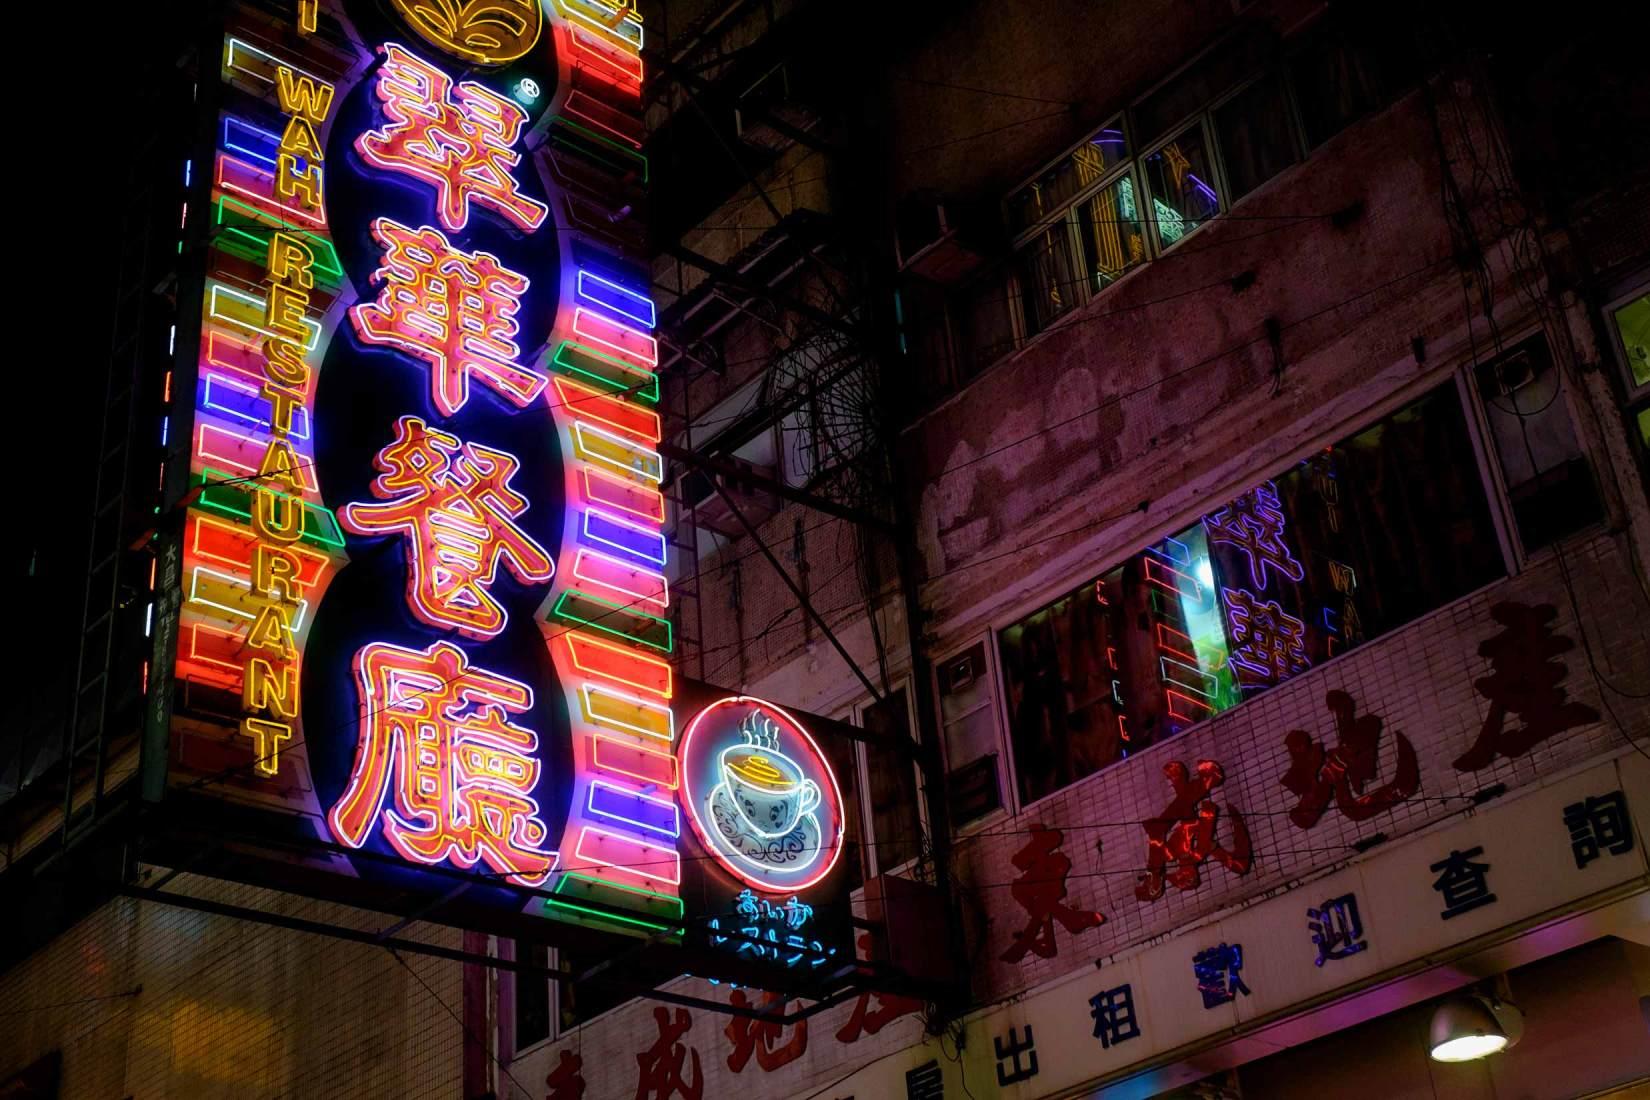 PWS020-0489-Sharon-Blance-Melbourne-photographer-Hong-Kong-neon